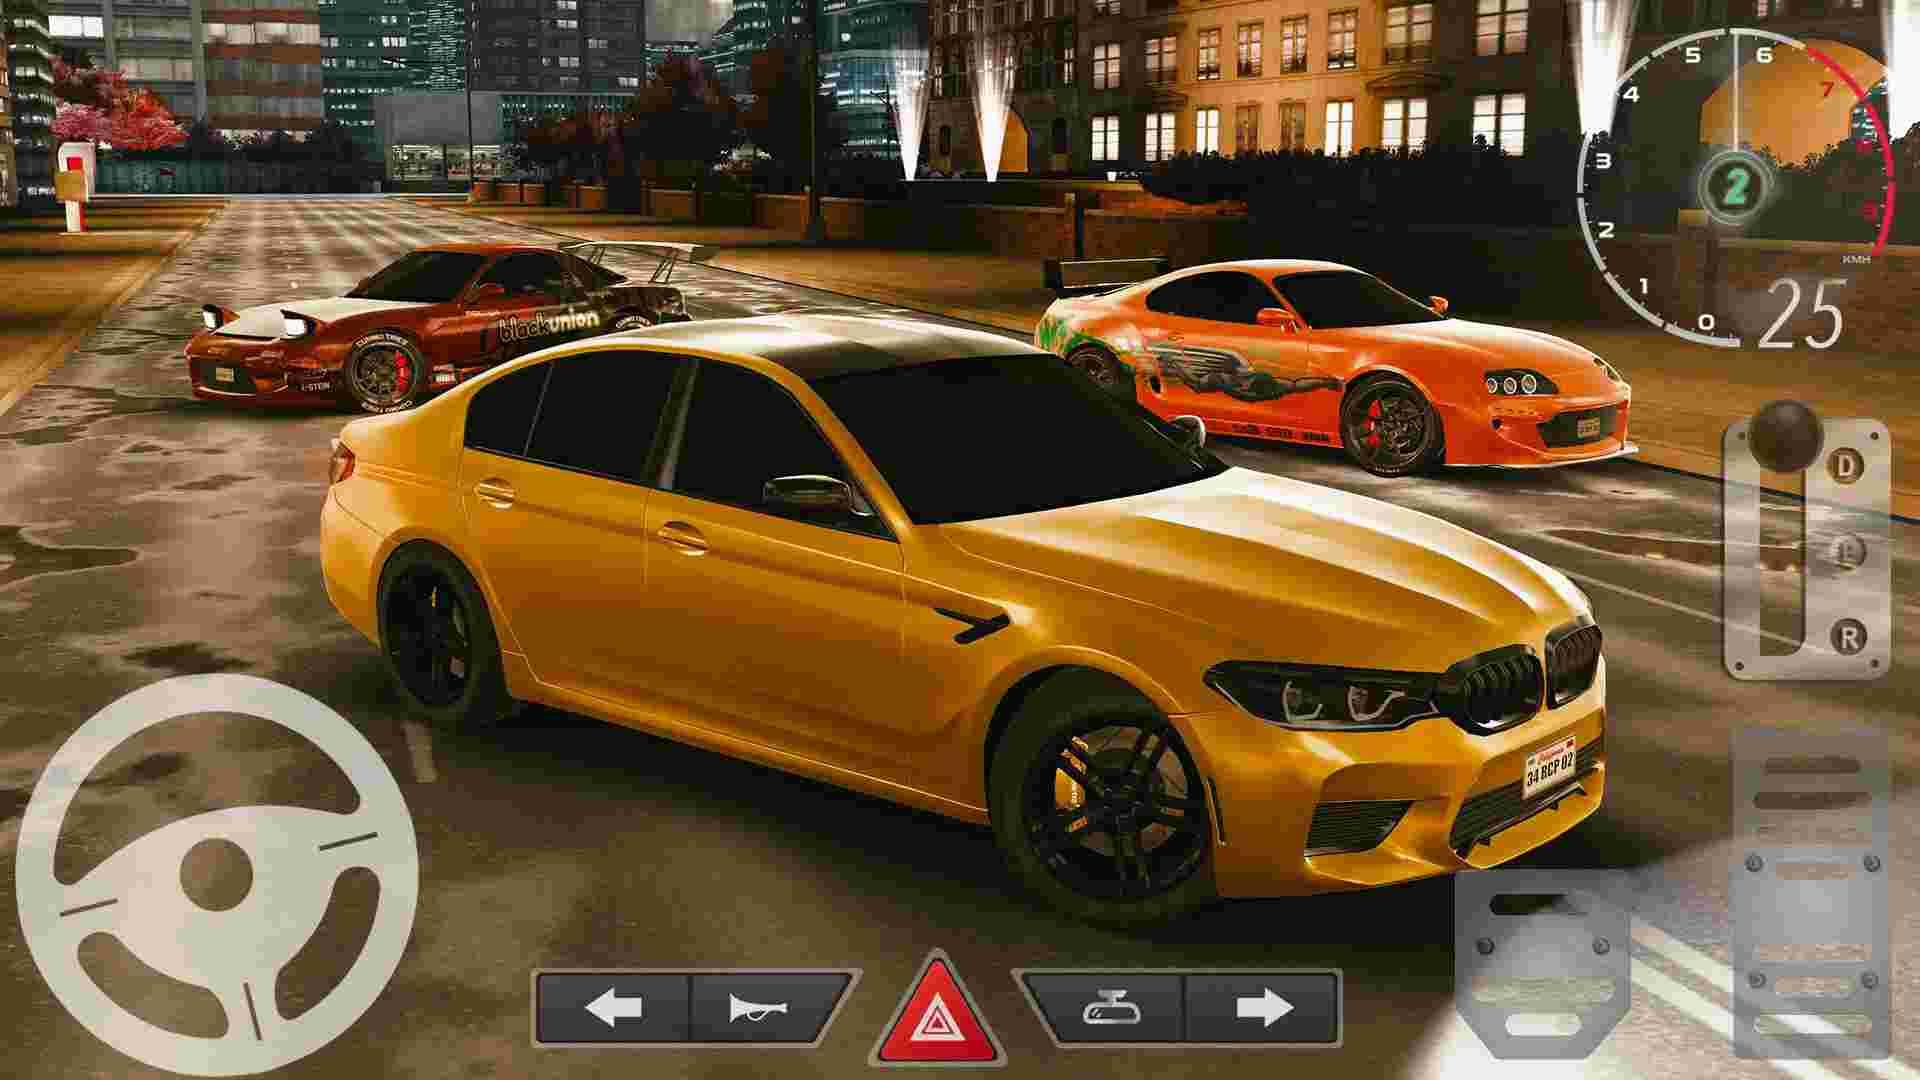 game Real Car Parking 2 mod hack